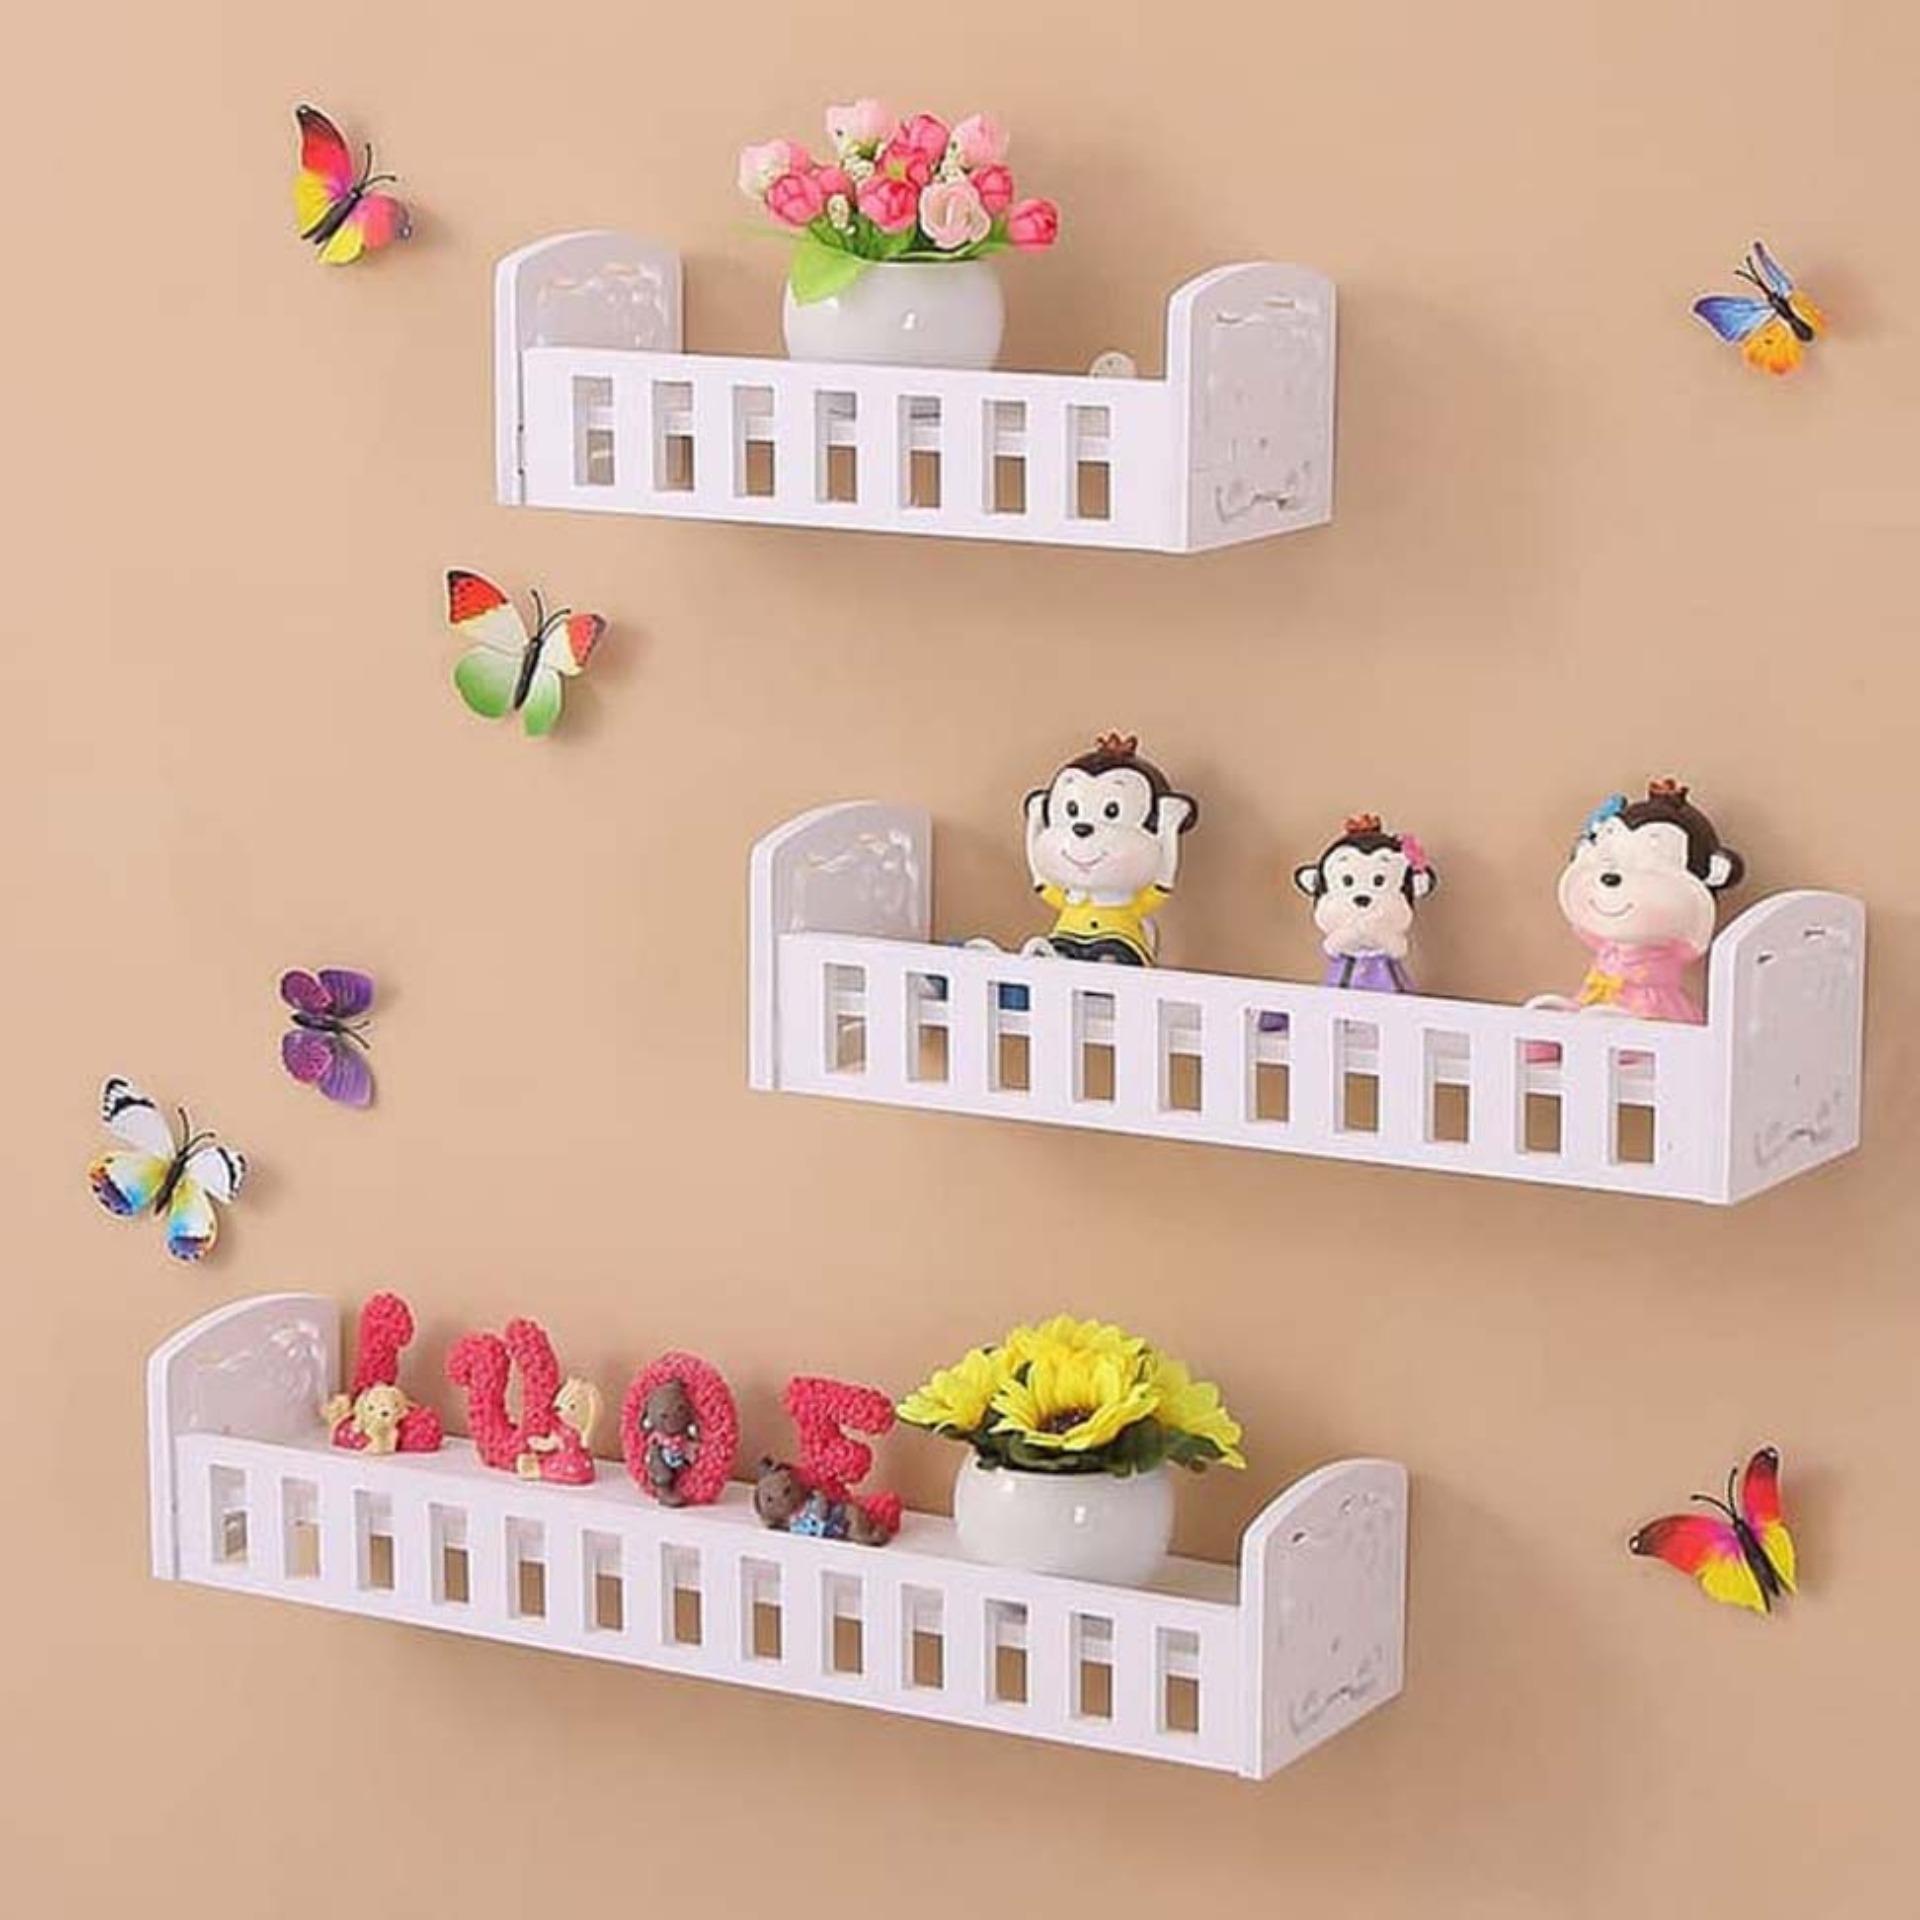 1 Set 3pcs Ambalan Floating Shelf Rak Dinding Daftar Harga Terkini Isi 3 Pcs Shelves Serbaguna Rumah Tangga